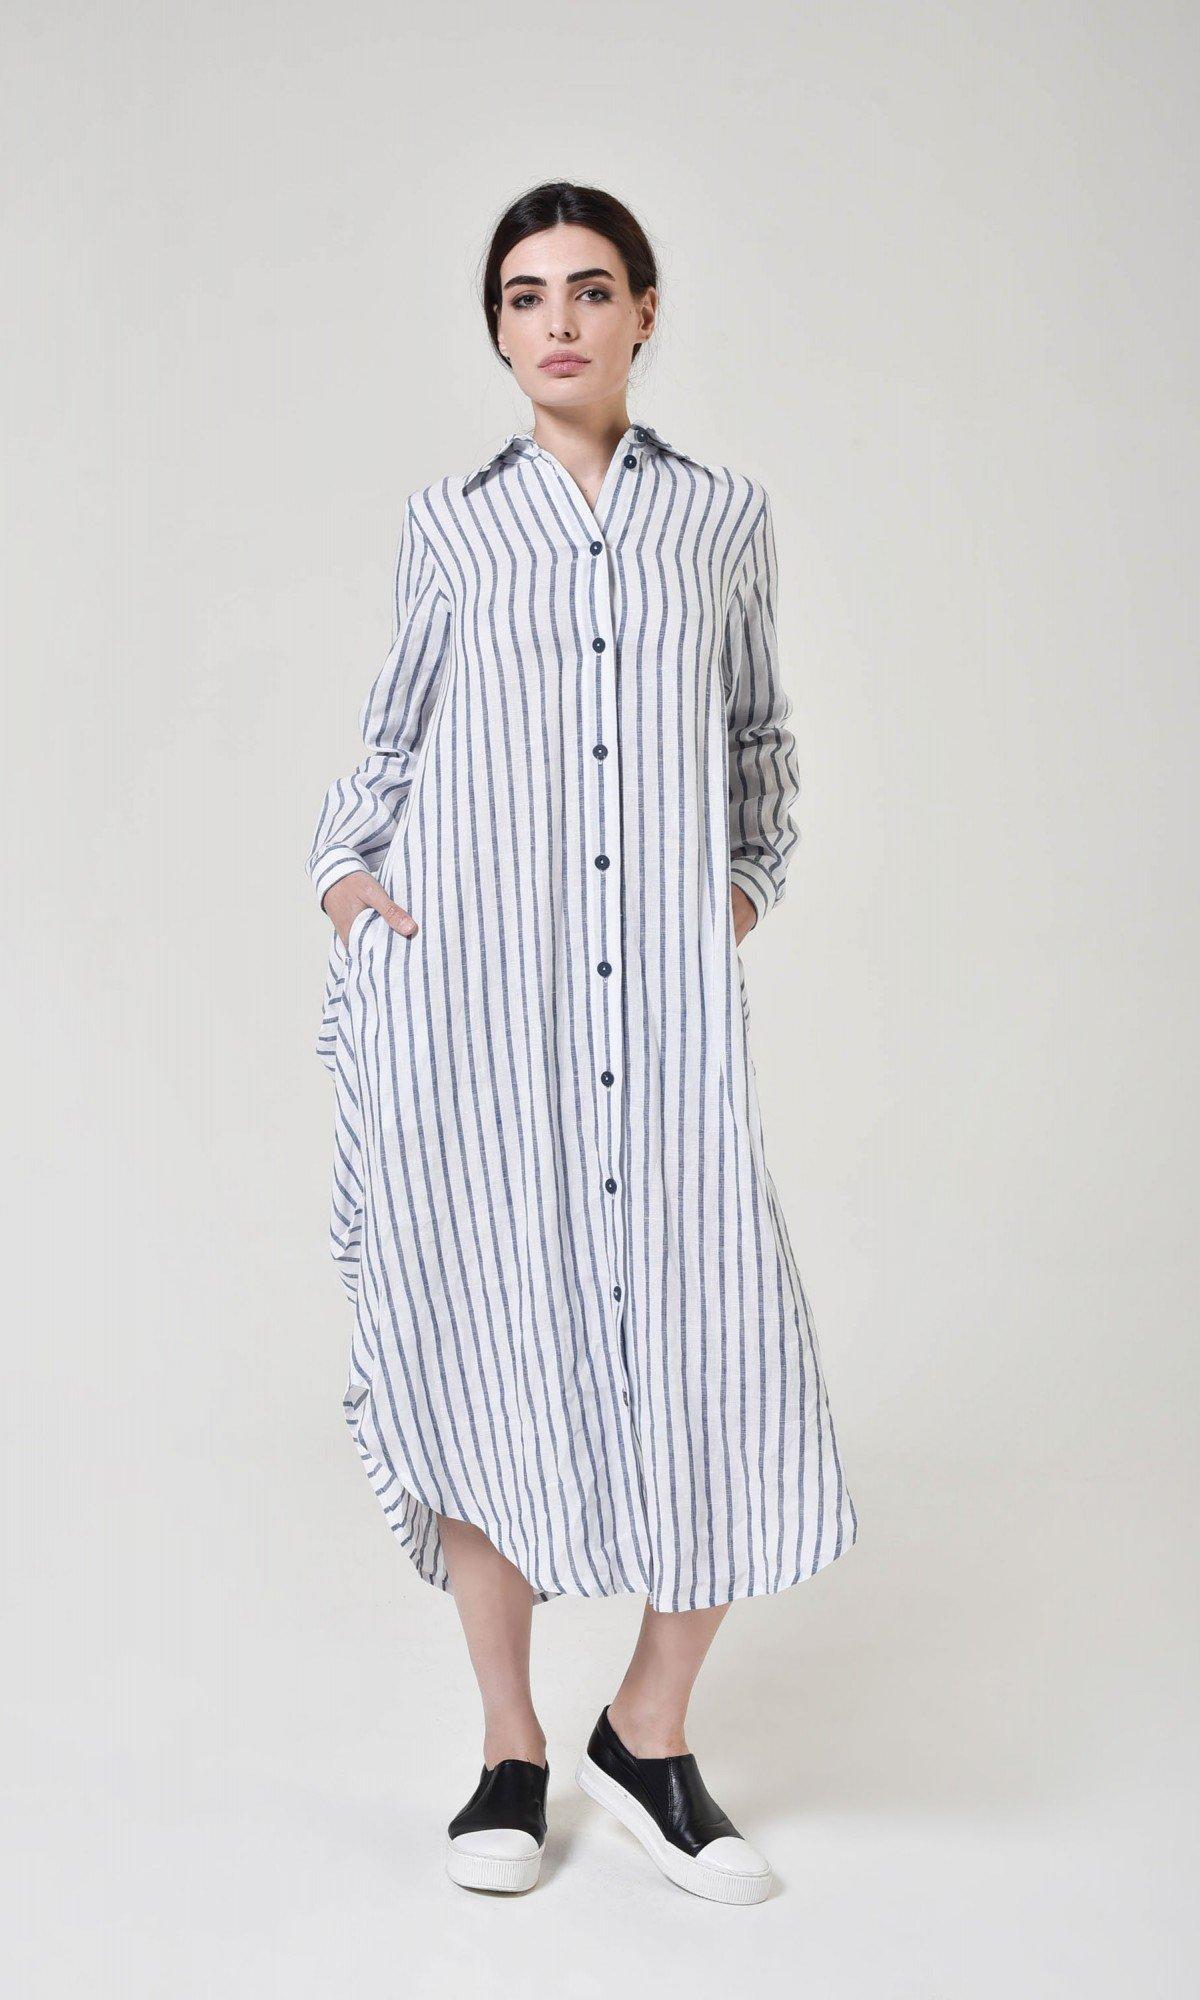 Elegant Stripped Shirt Dress